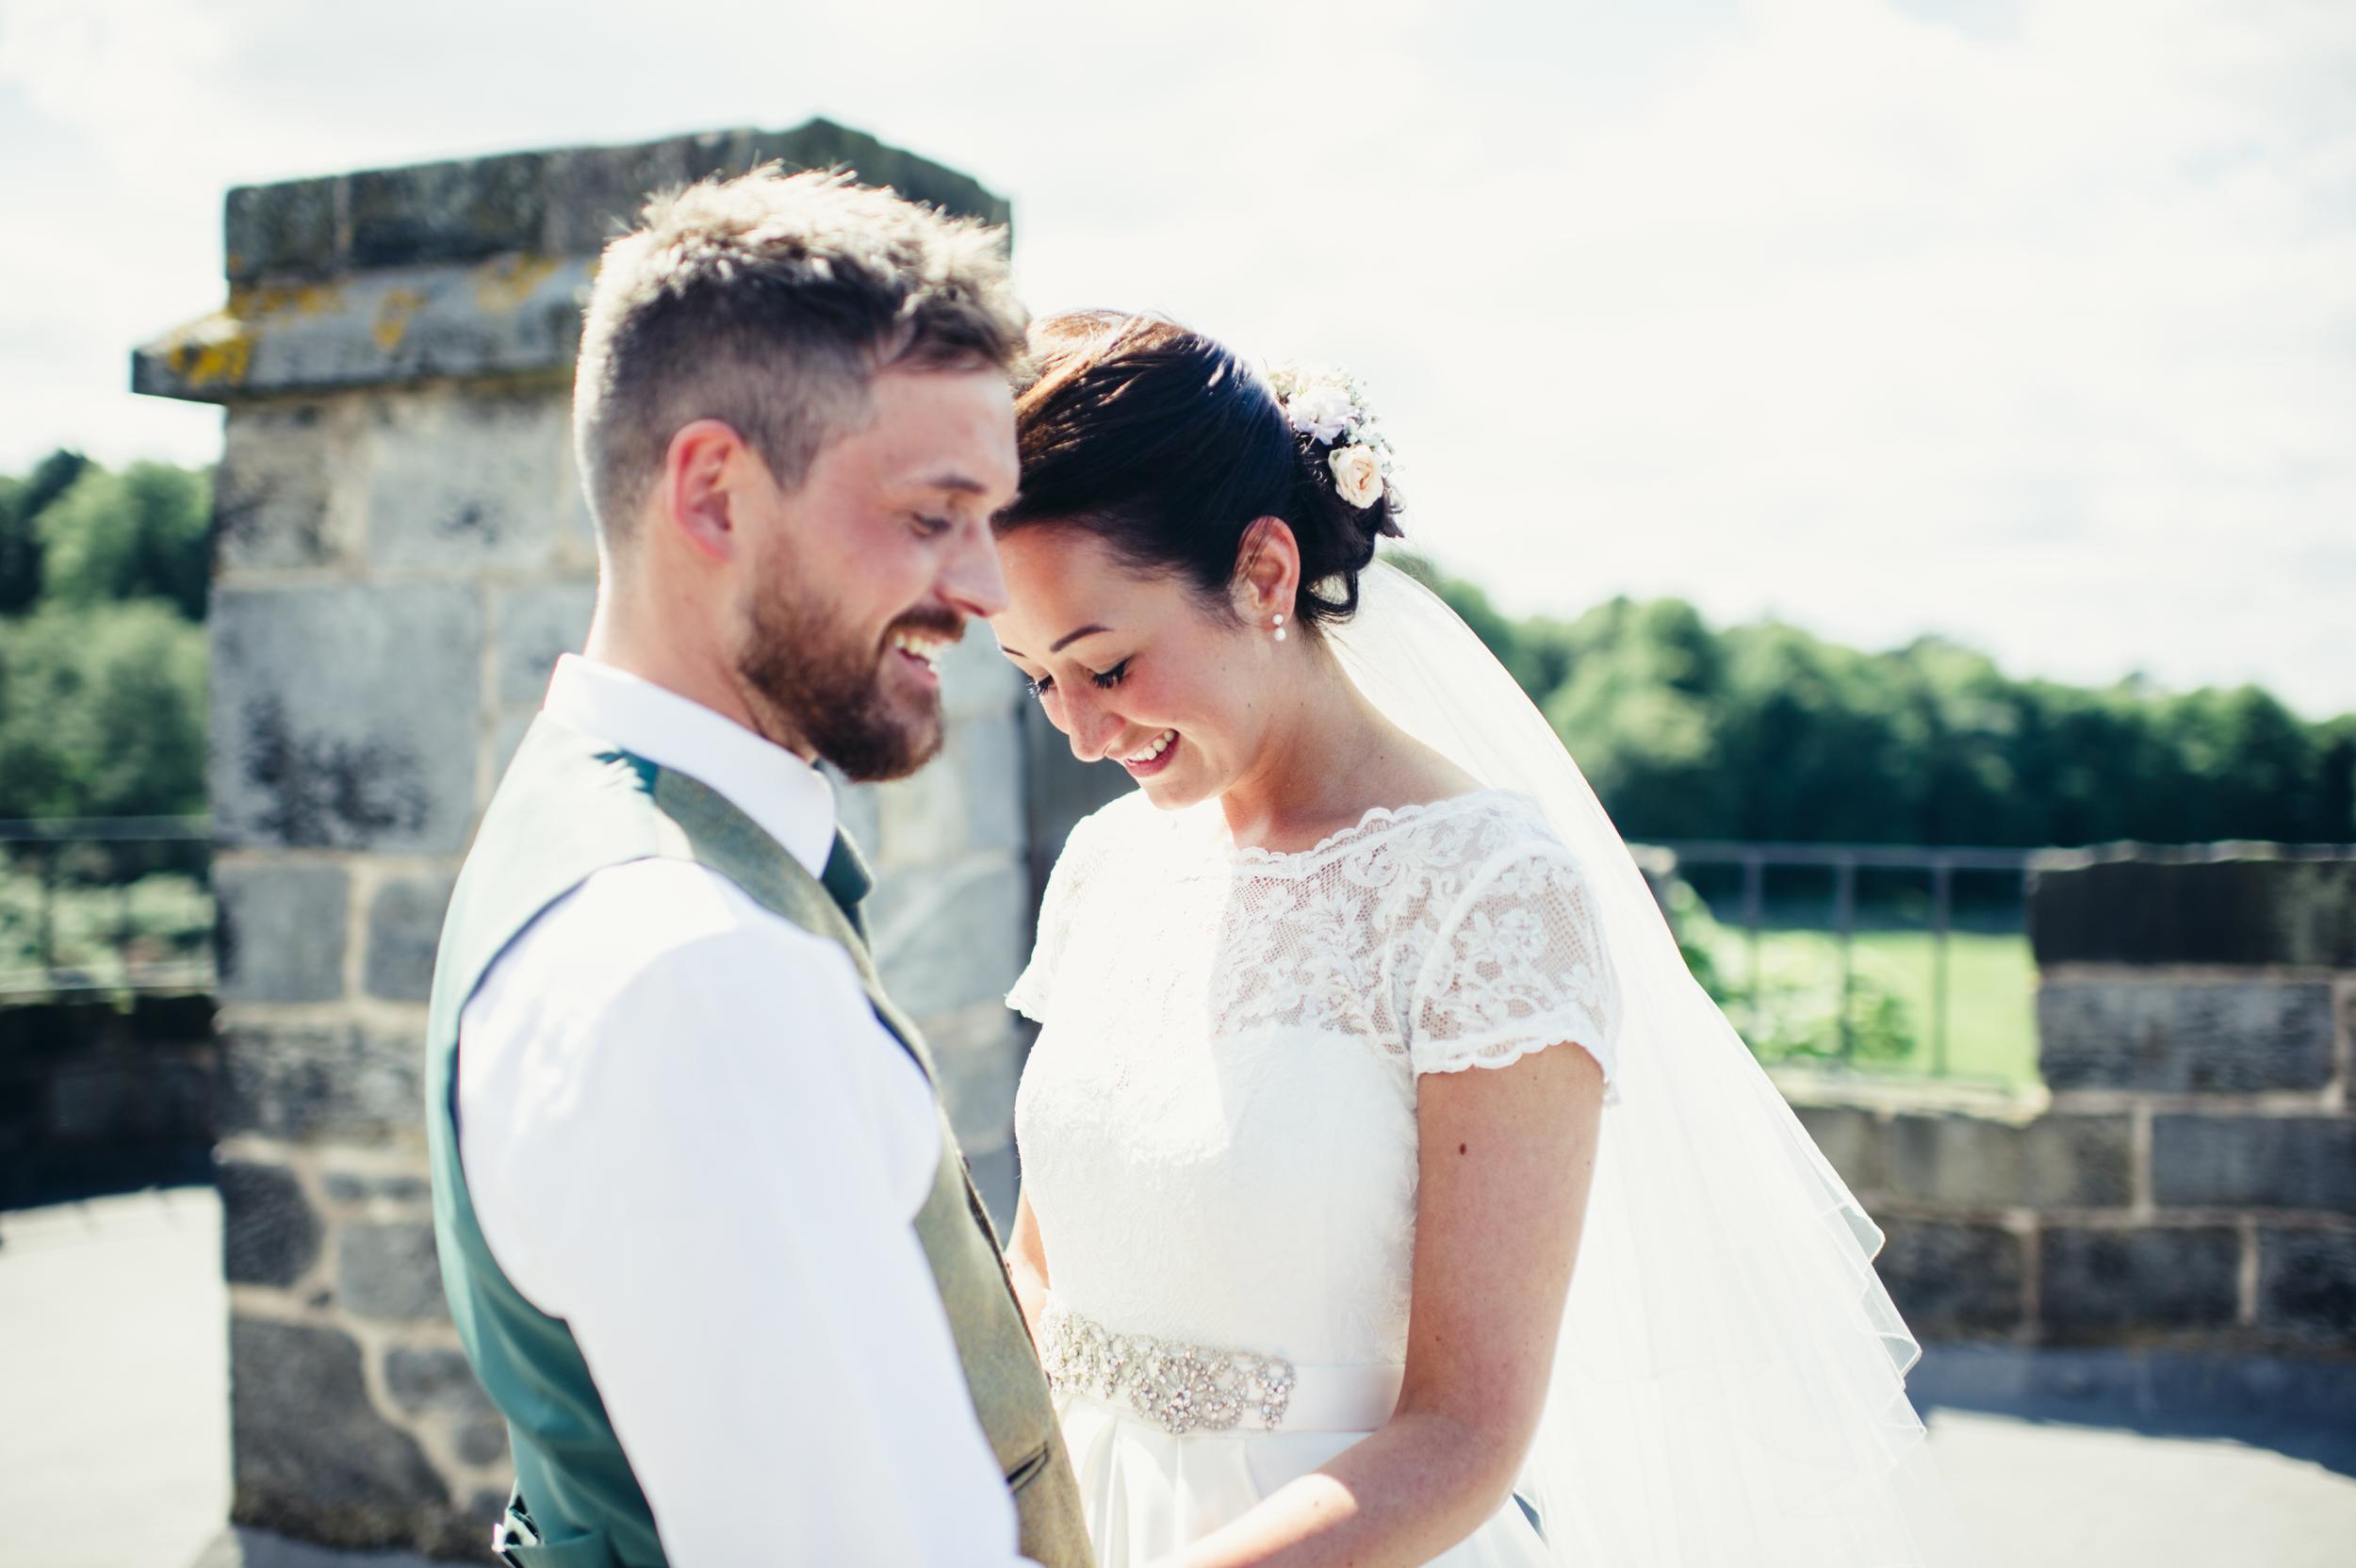 0115-lisa-devine-alternative-creative-wedding-photography-glasgow-edinburgh.JPG